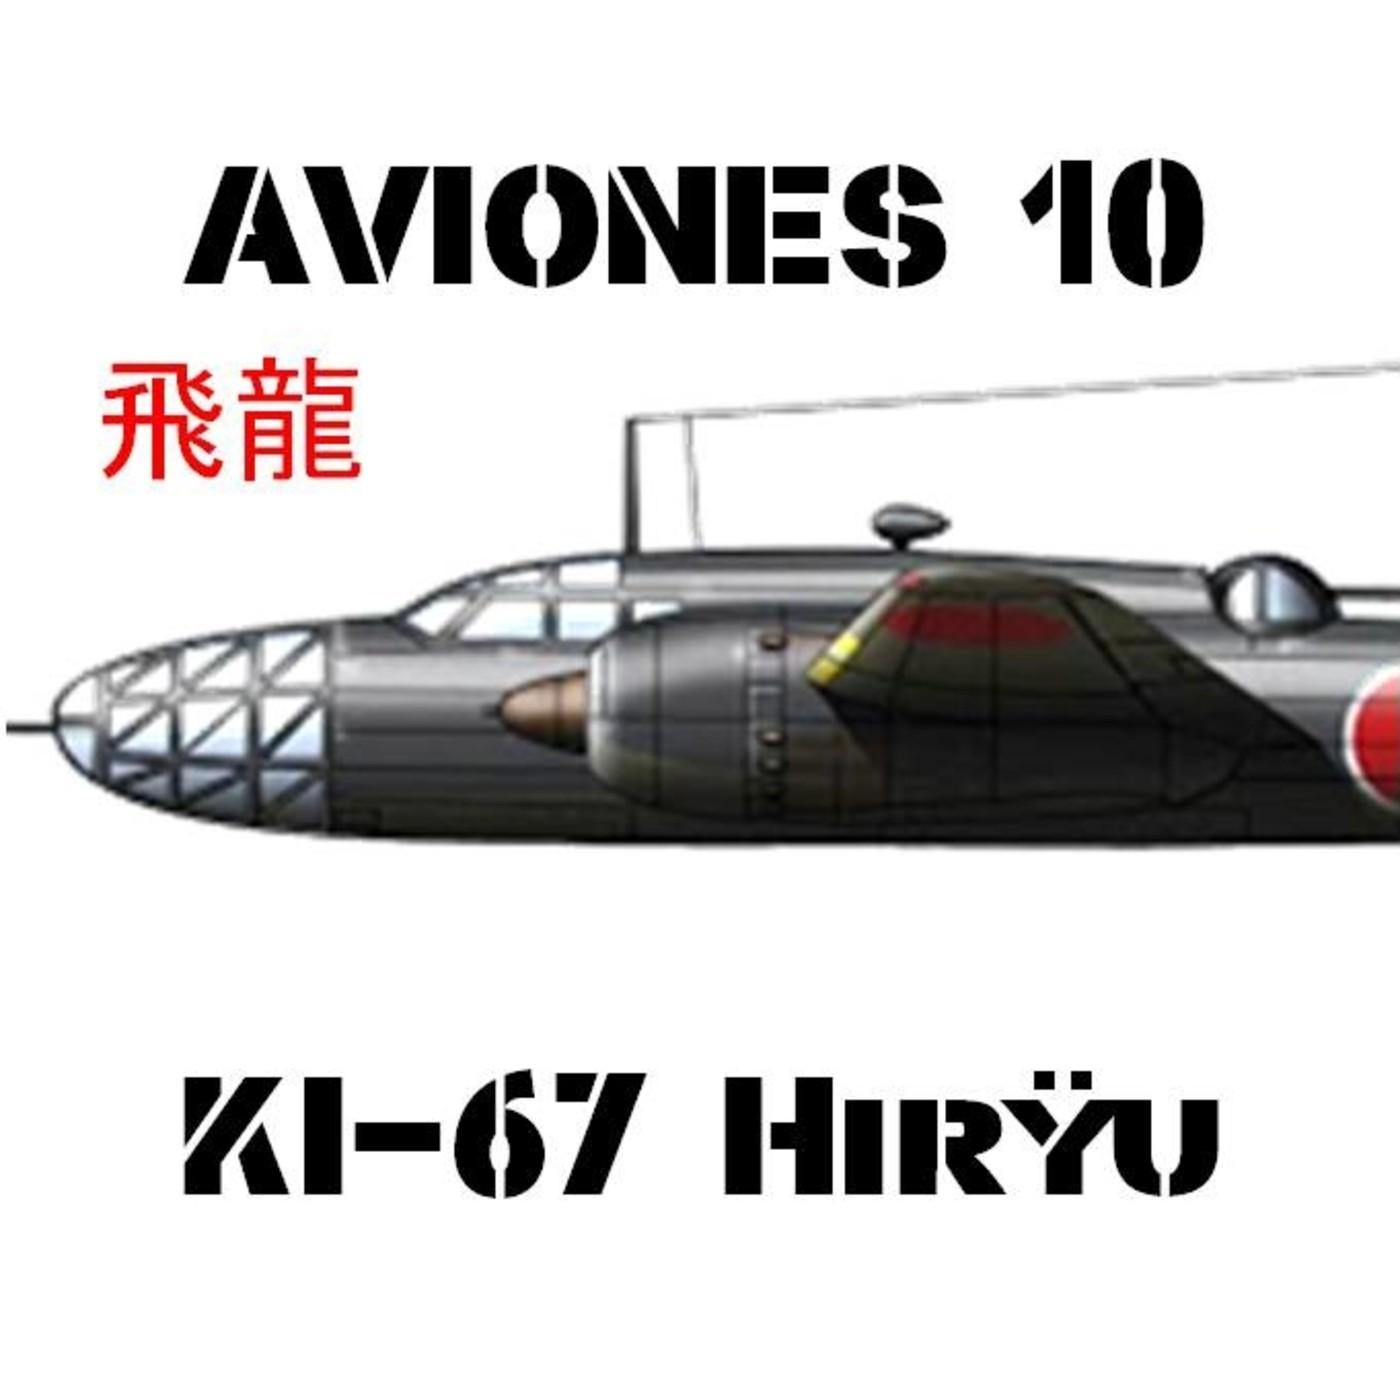 AVIONES 10 #83 Mitsubishi KI-67 Hiryu, Dragón volador